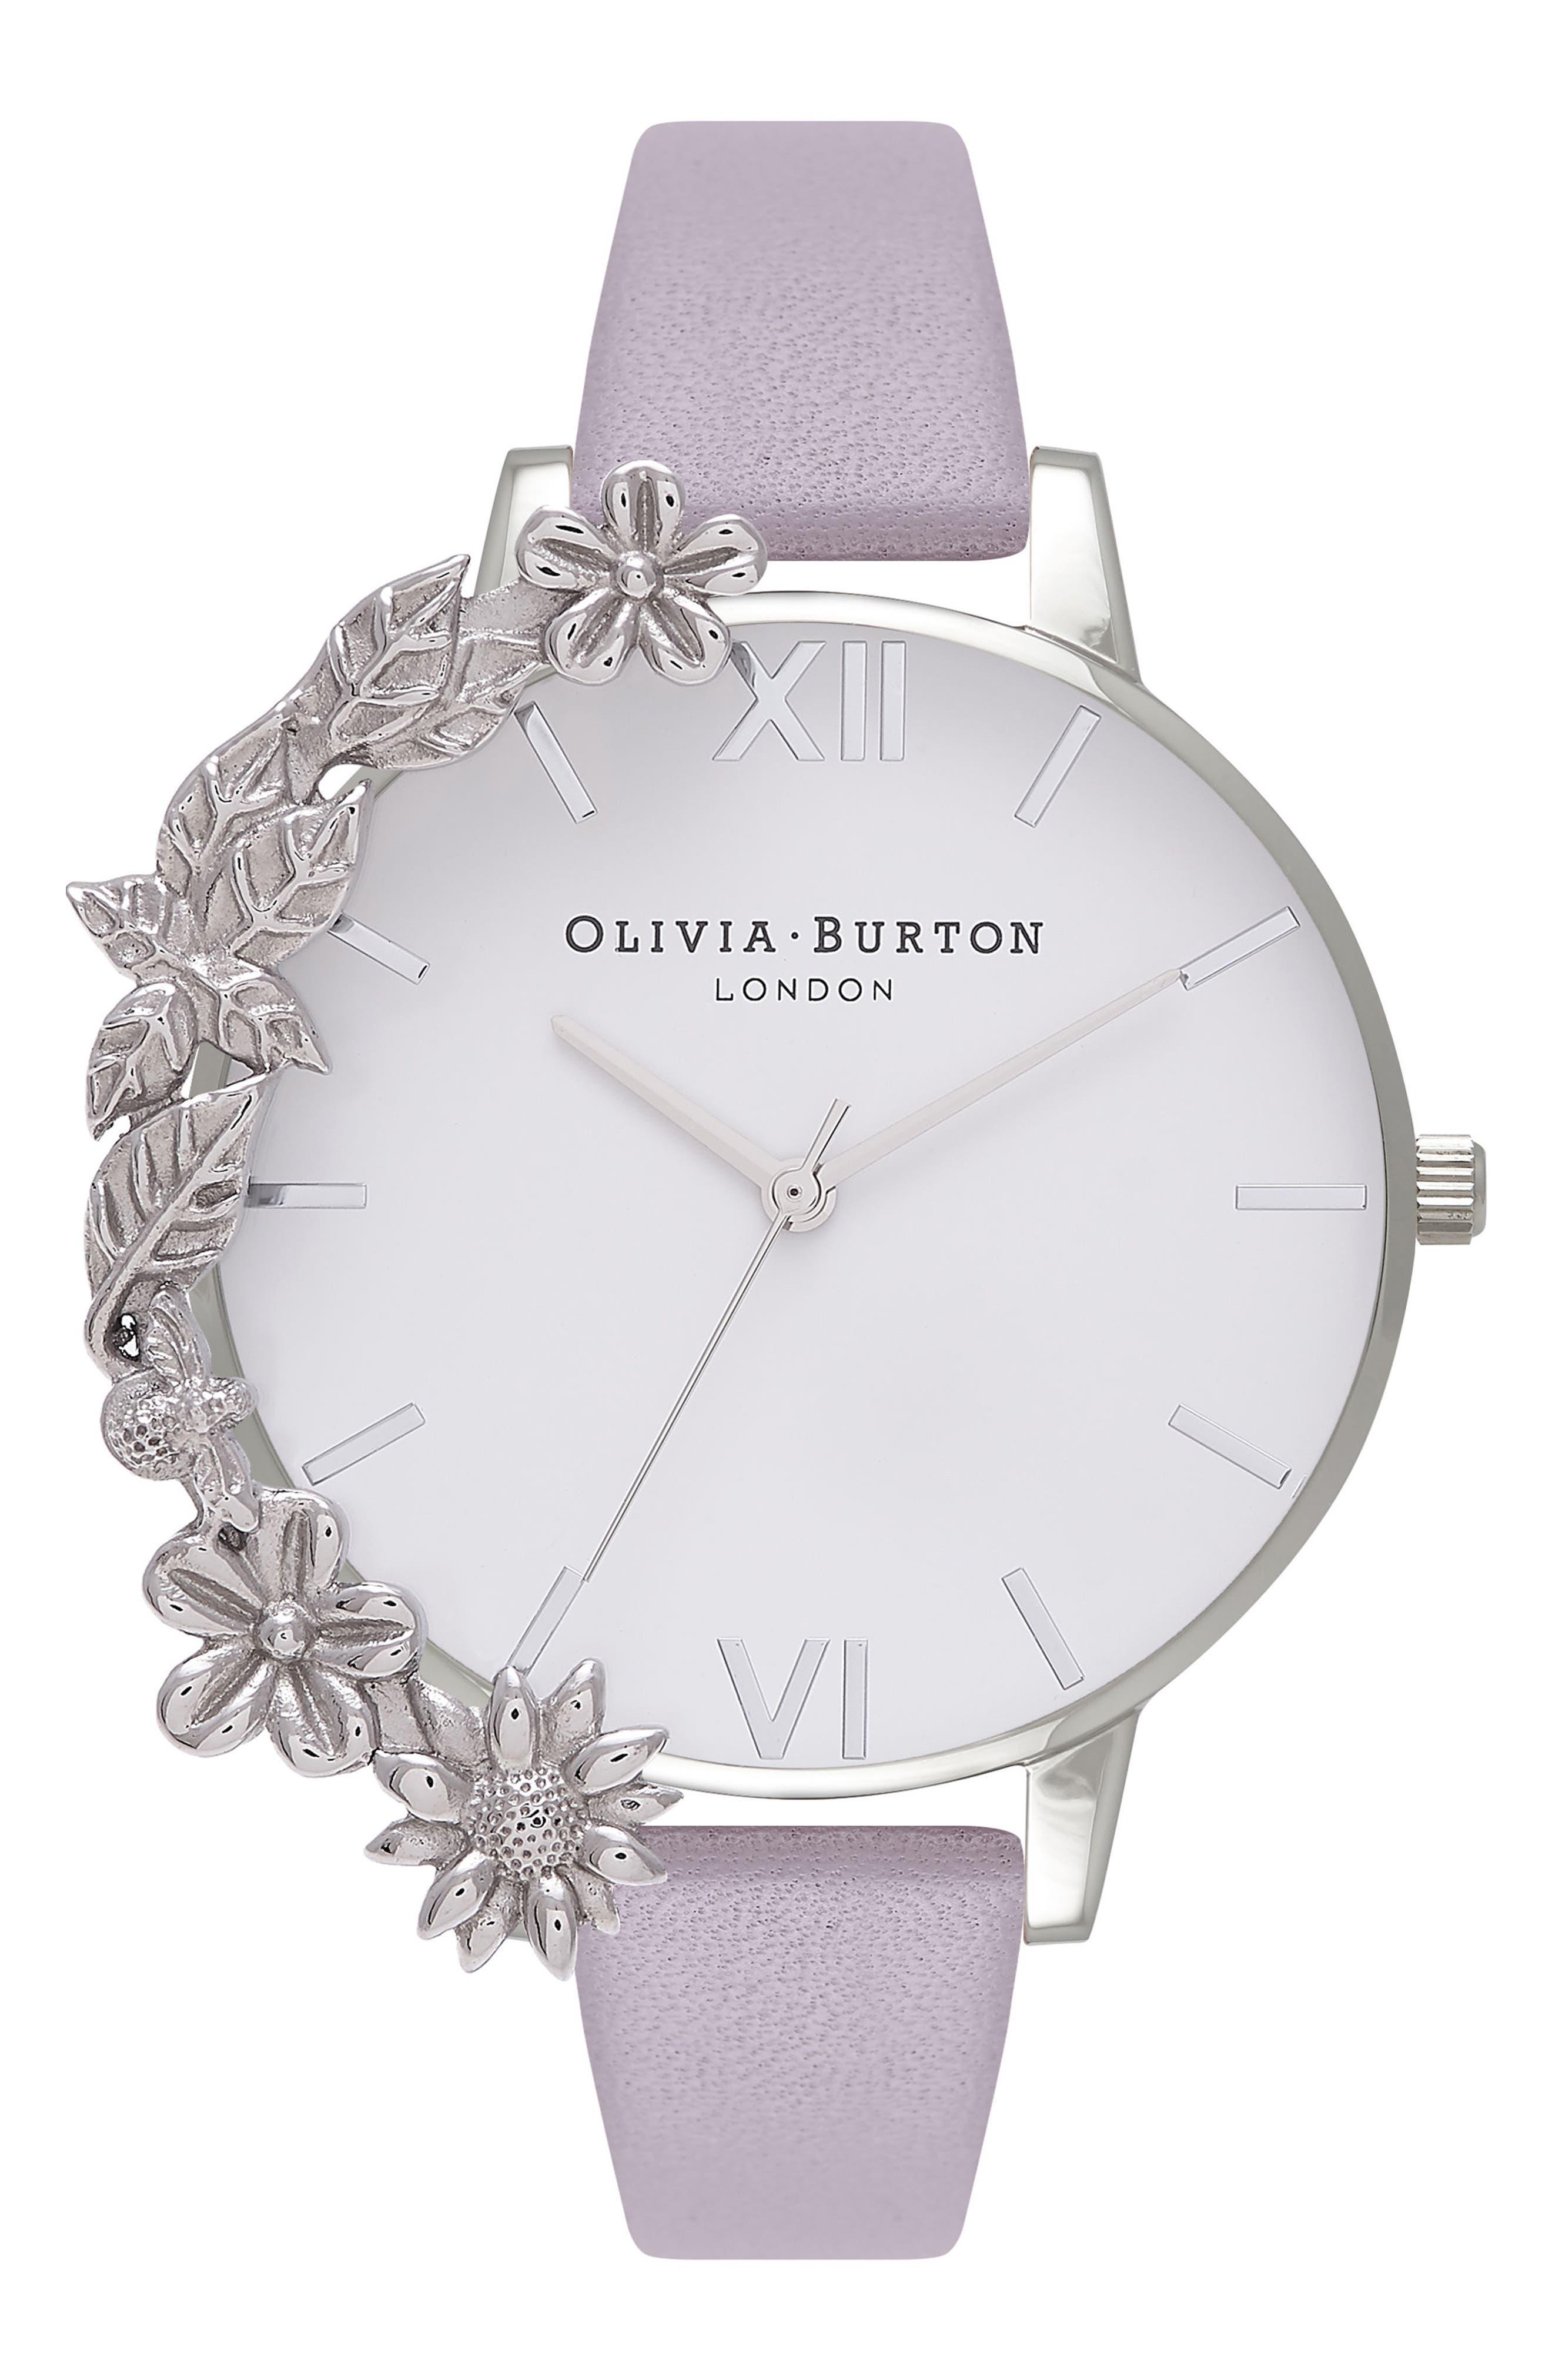 Olivia Burton Case Cuff Leather Strap Watch, 38mm